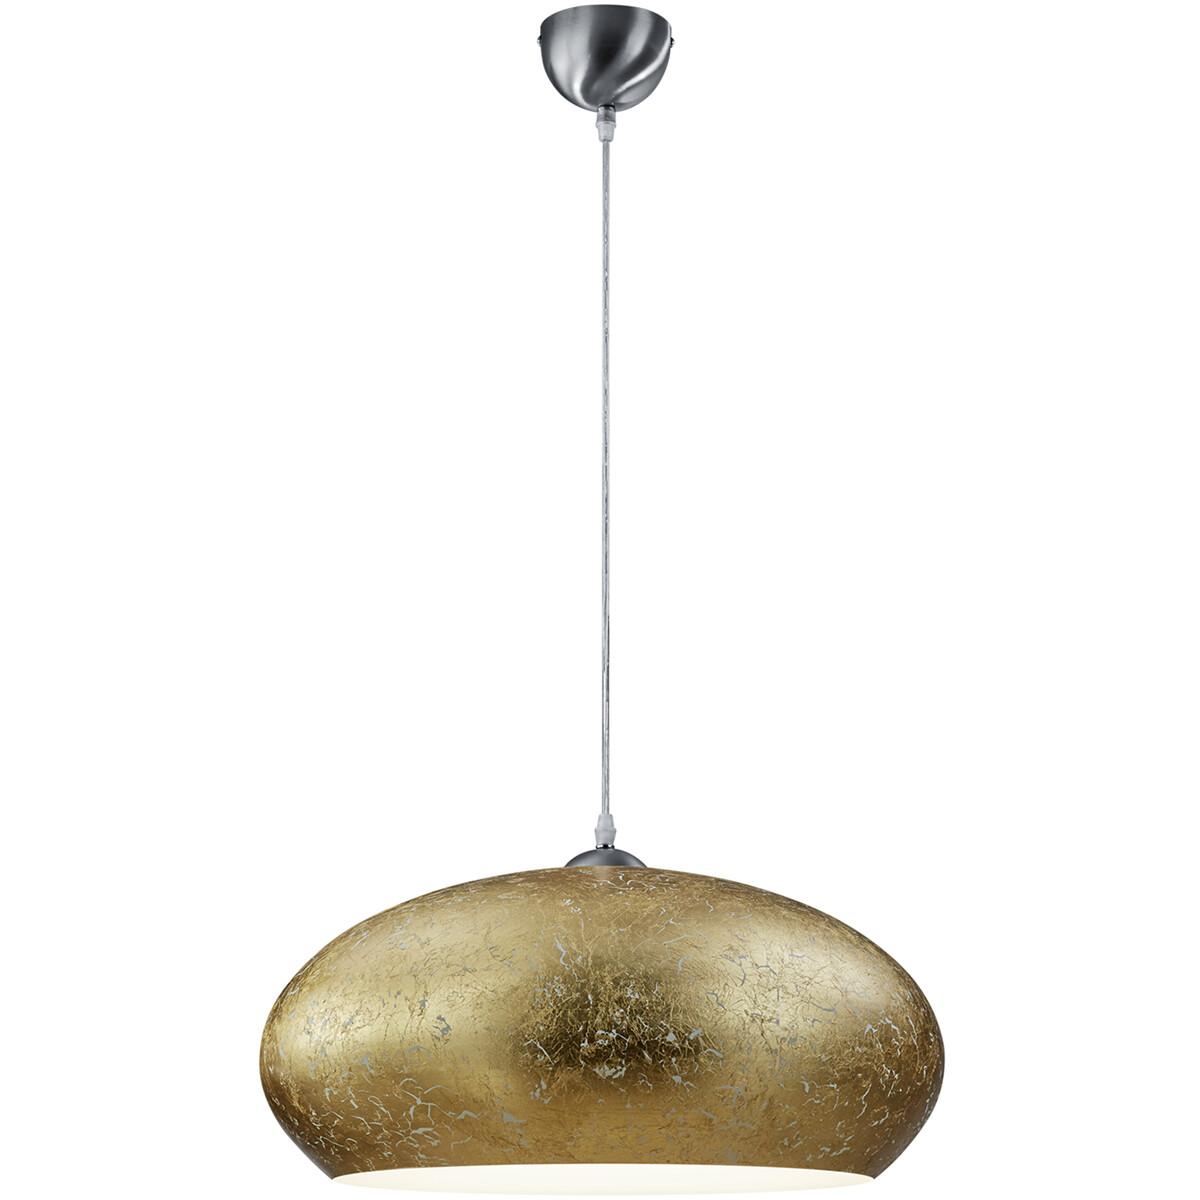 LED Hanglamp - Hangverlichting - Trion Otarino - E27 Fitting - Rond - Mat Nikkel - Aluminium